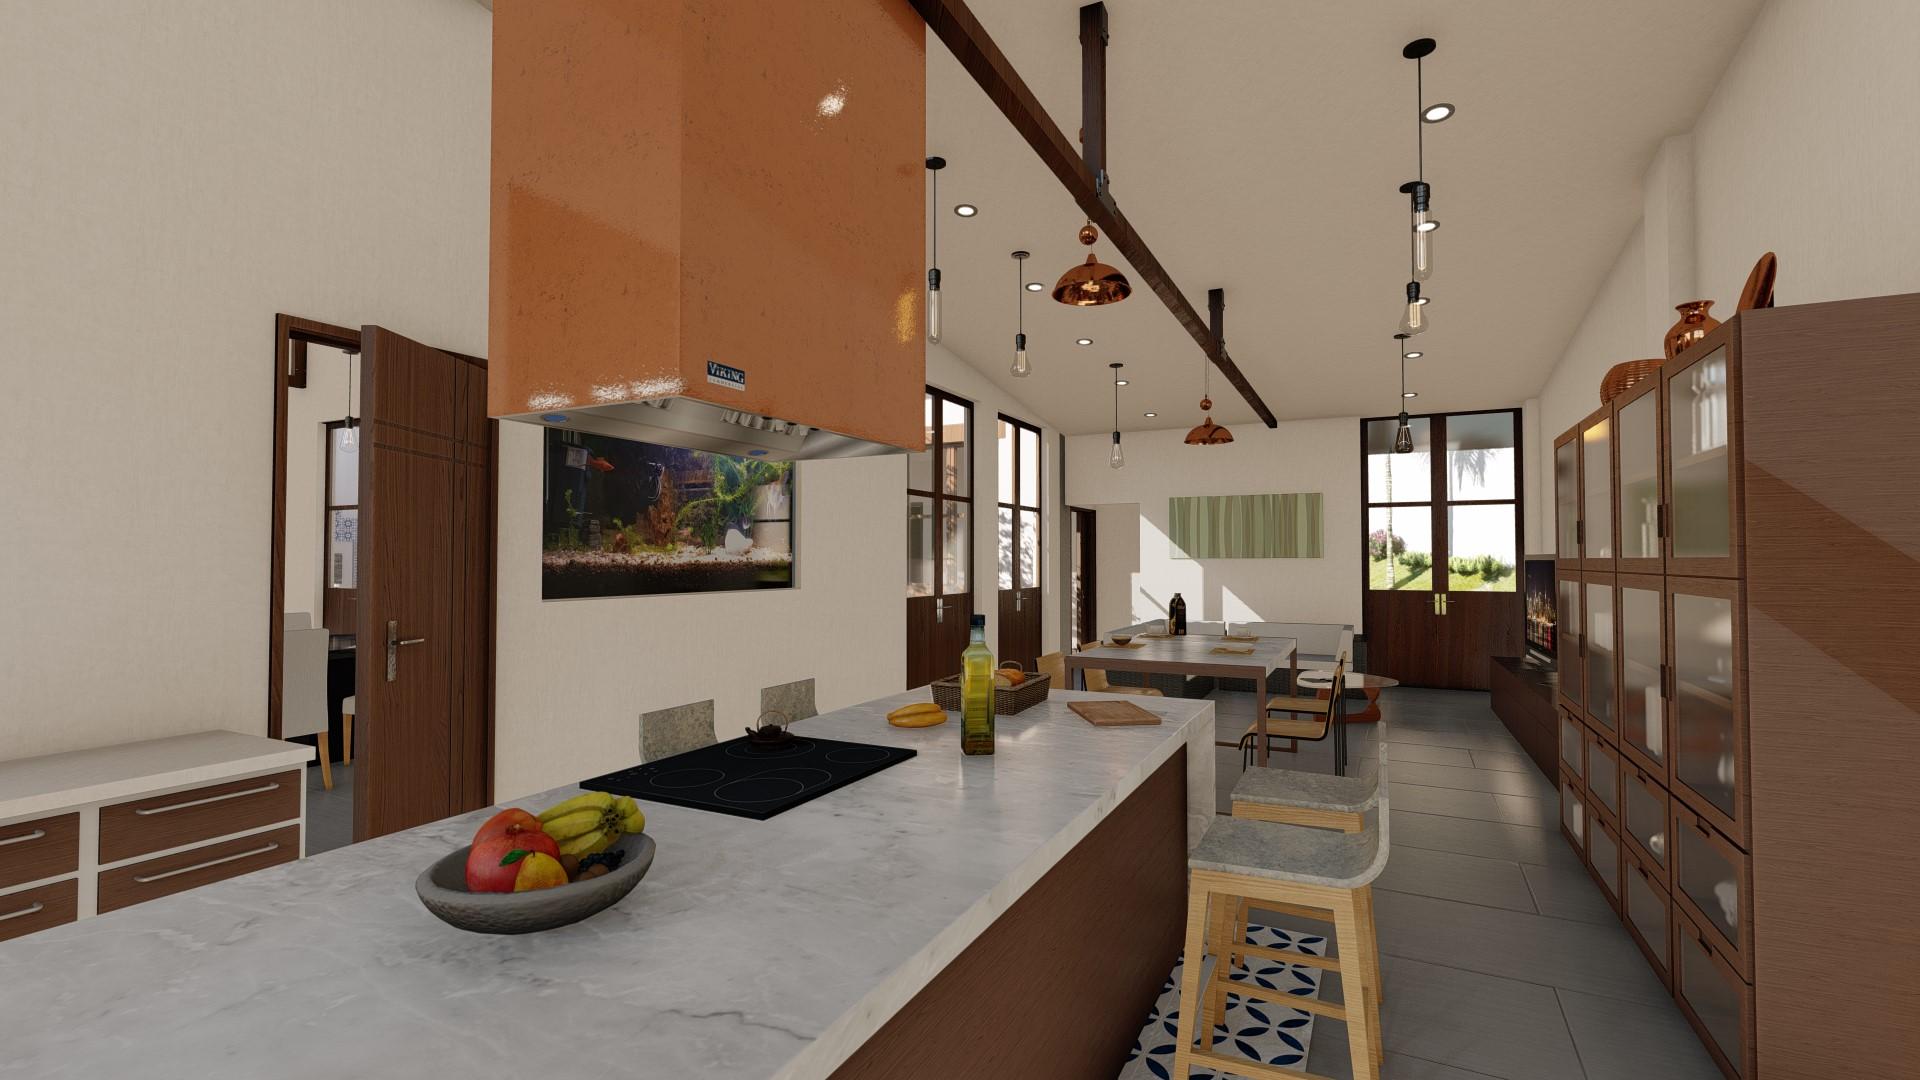 Interior Cocina.jpg